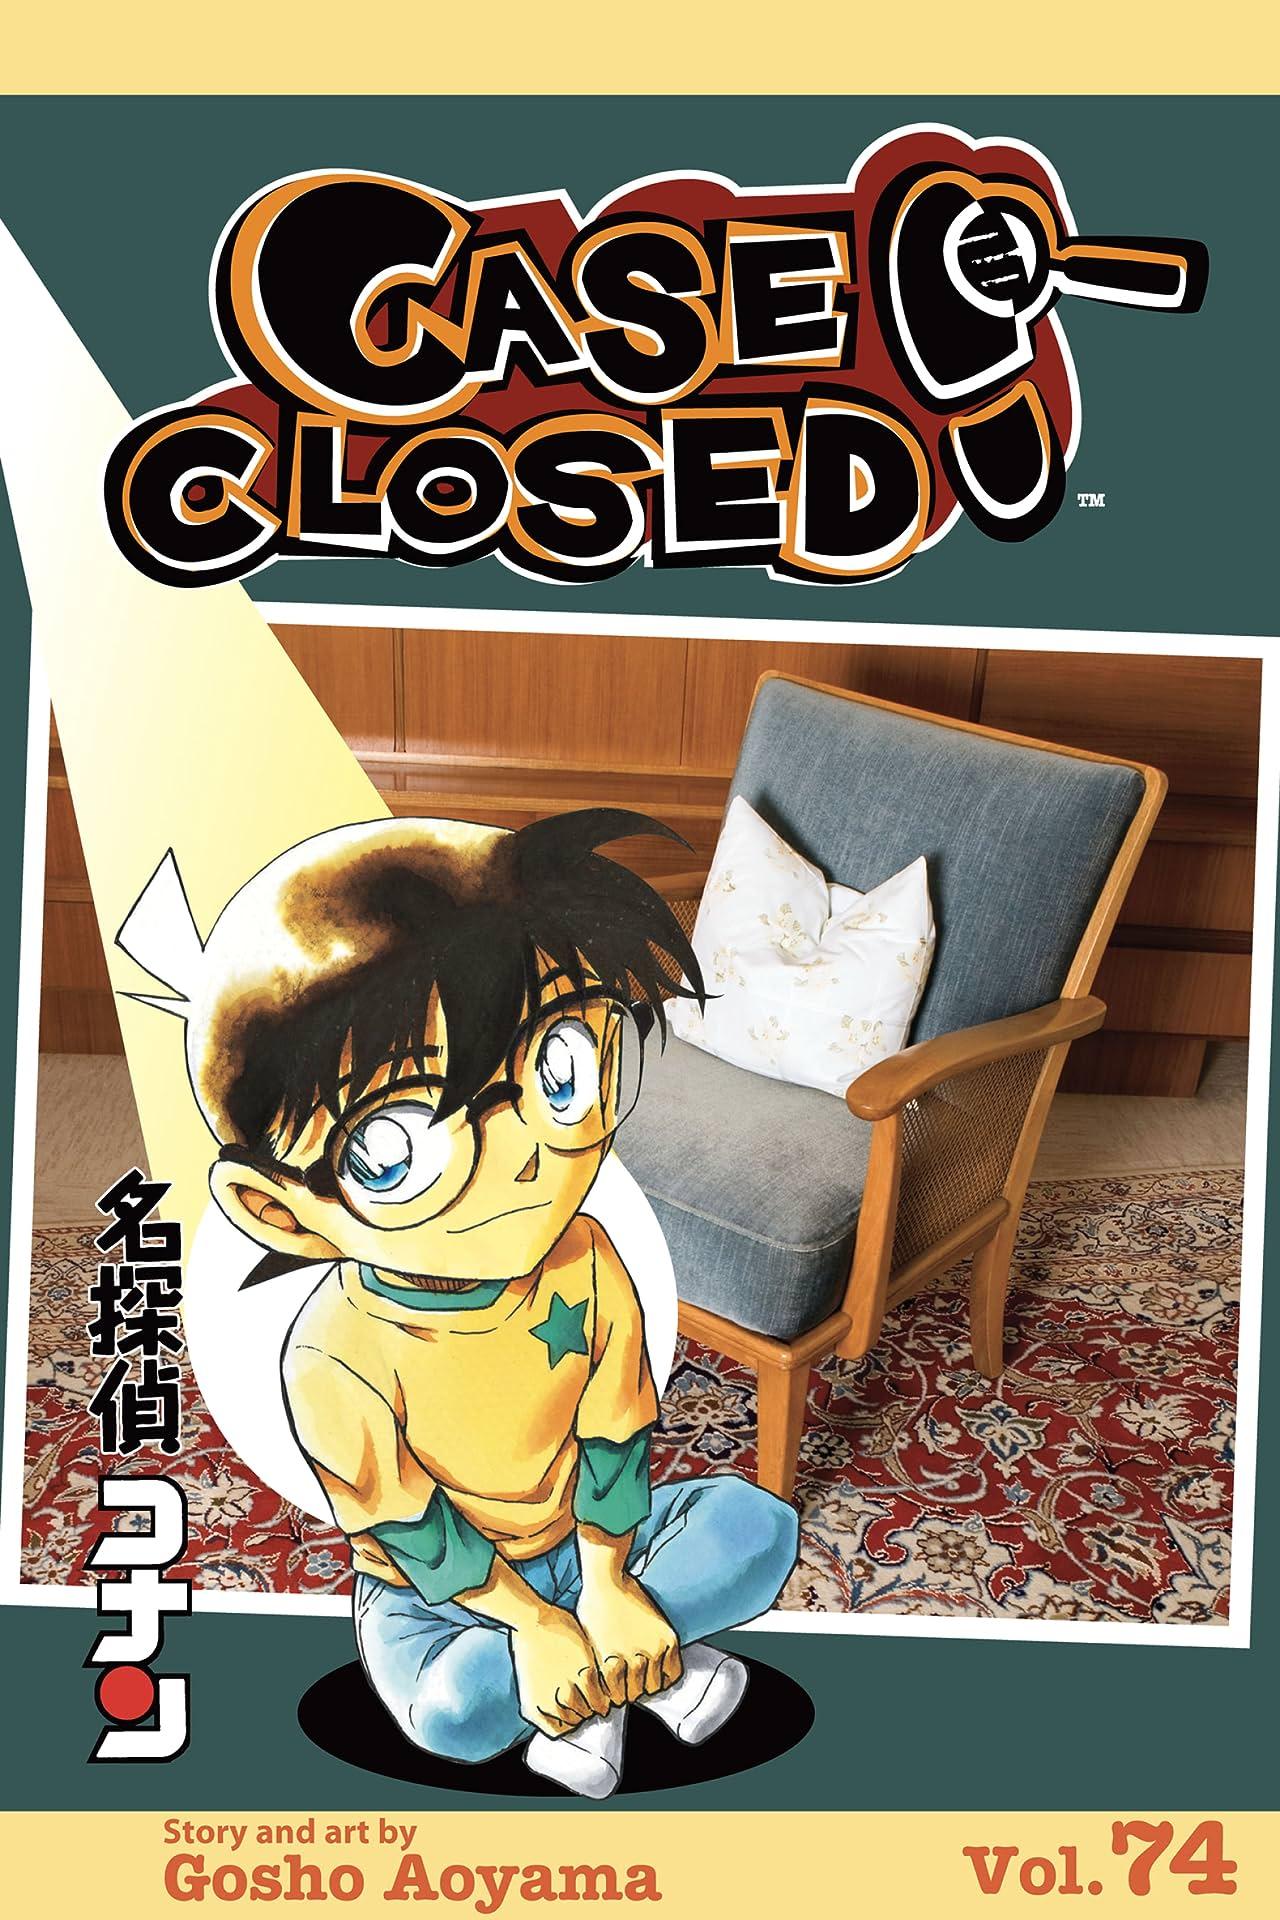 Case Closed Vol. 74: An Eye For An Eye